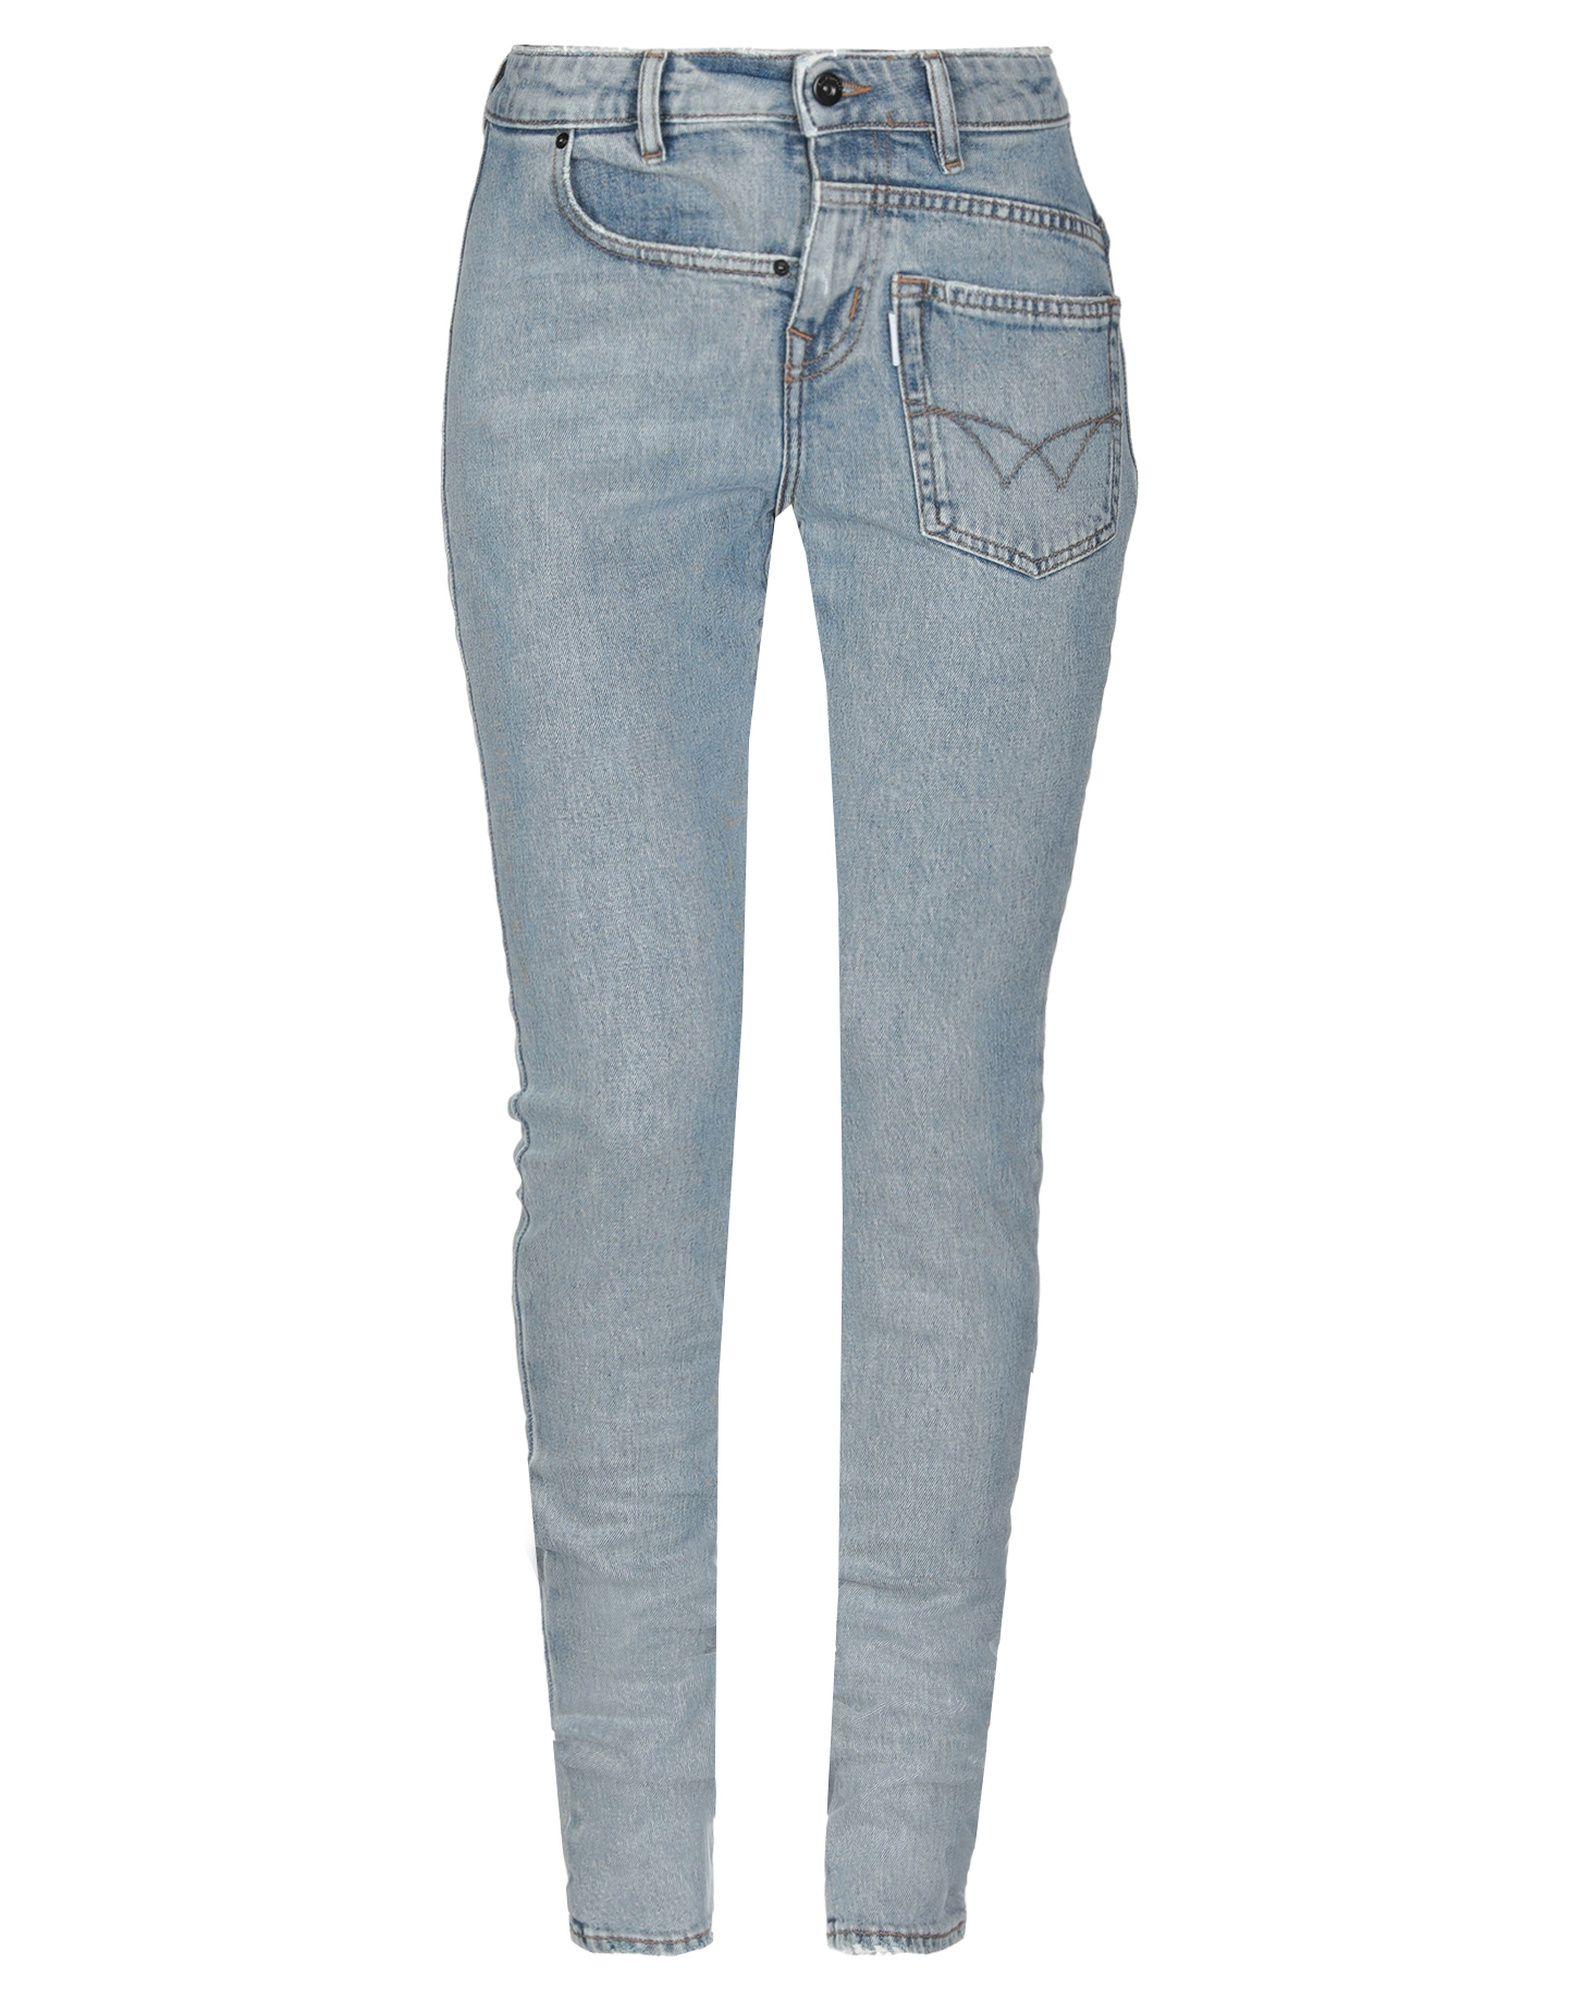 FILLES A PAPA FOR ANTONIA EXCELSIOR Джинсовые брюки